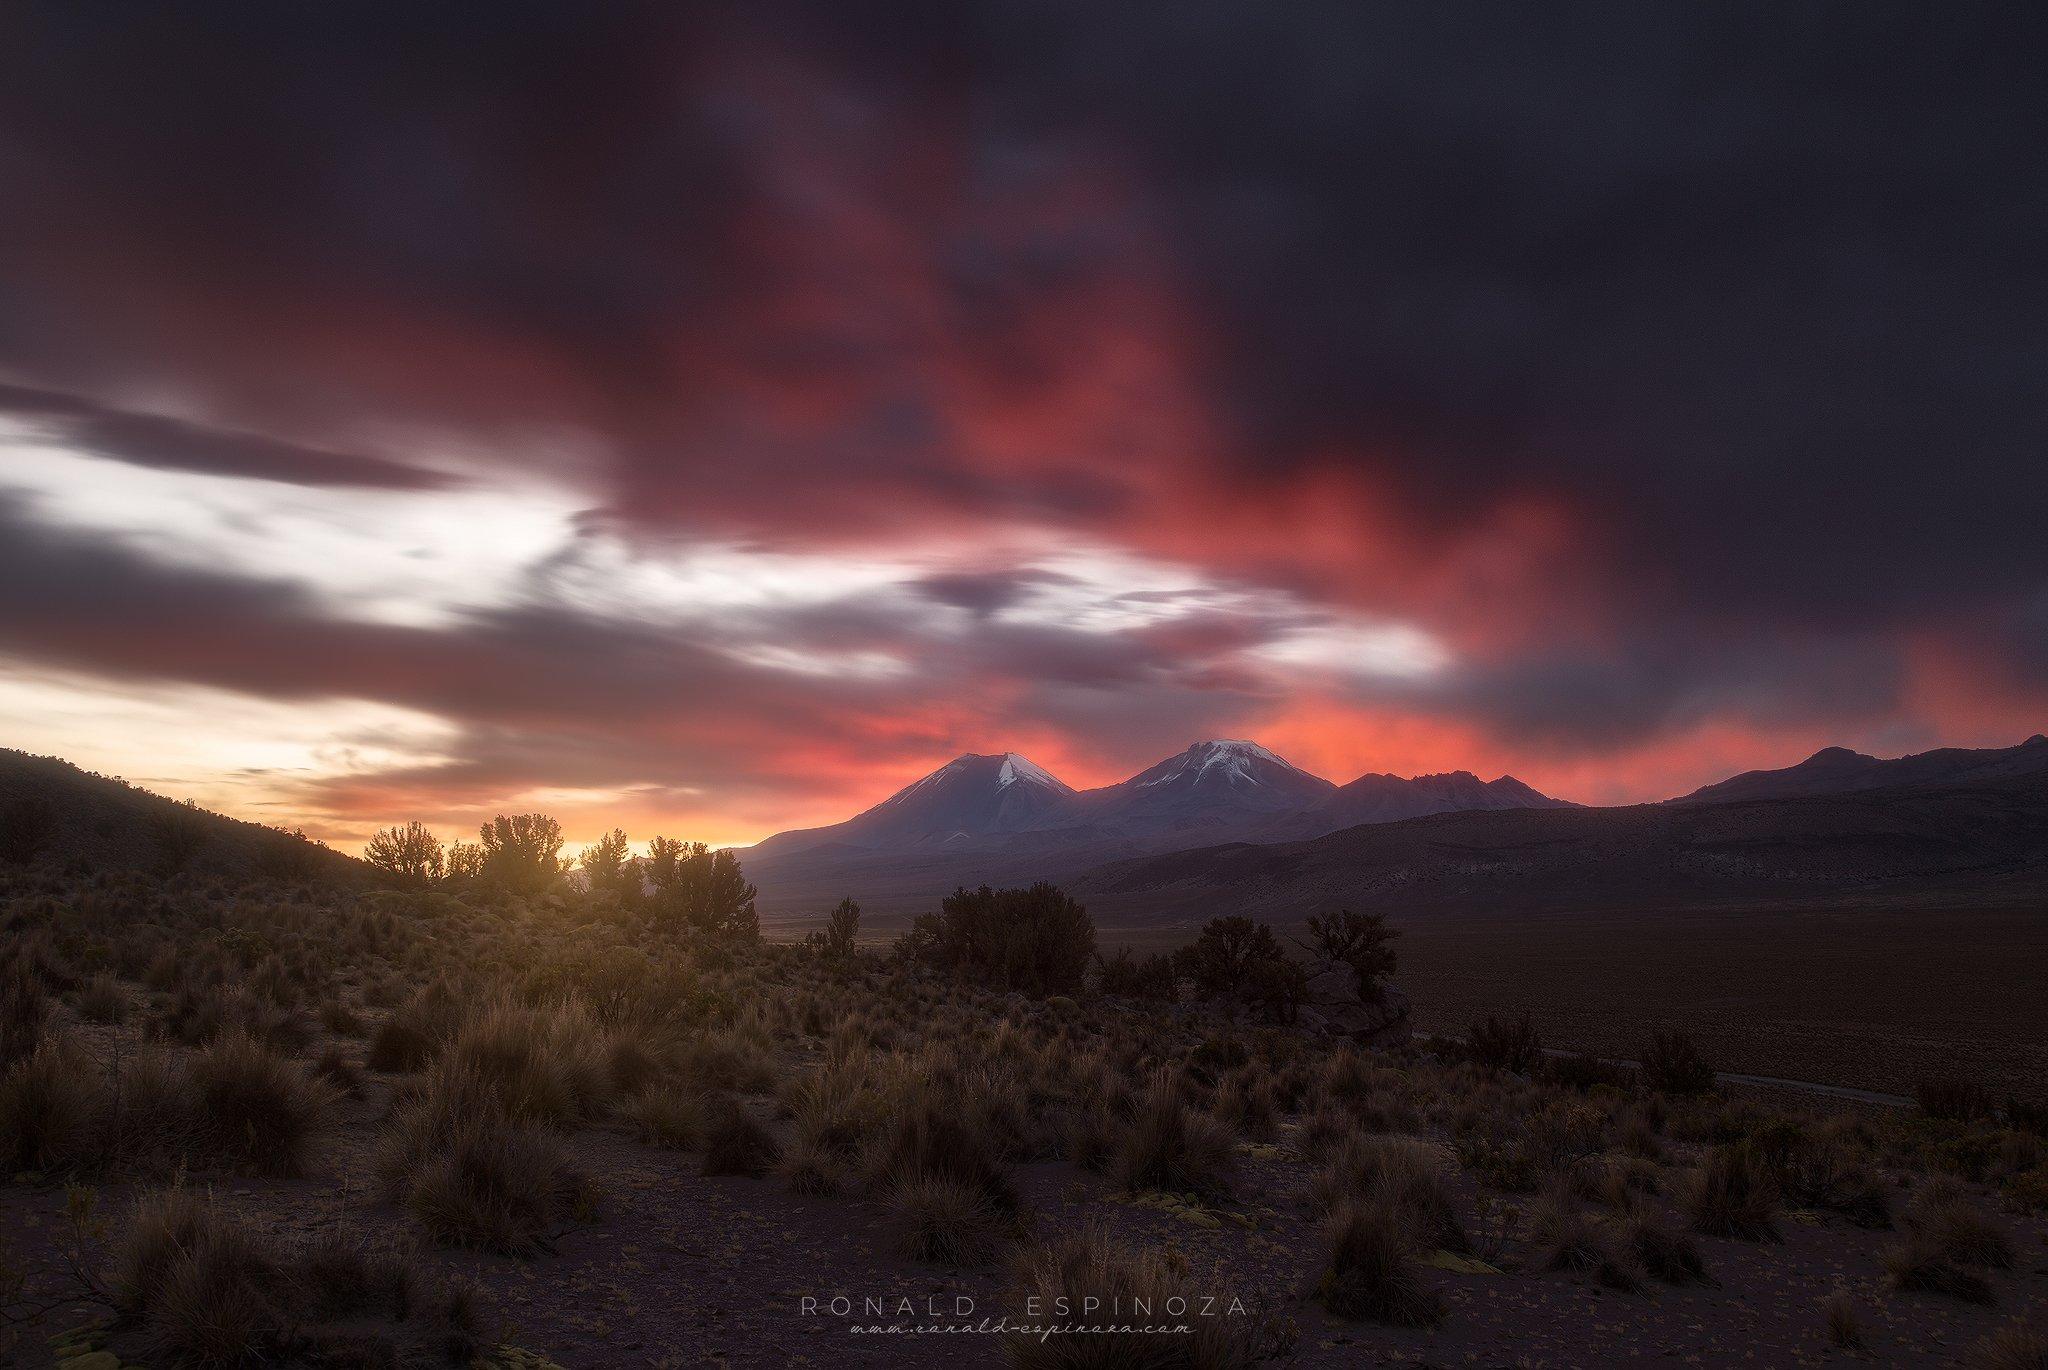 landscape, nature, travel, sunset, bolivia, mountain, conservation, Espinoza Marón Ronald Alex